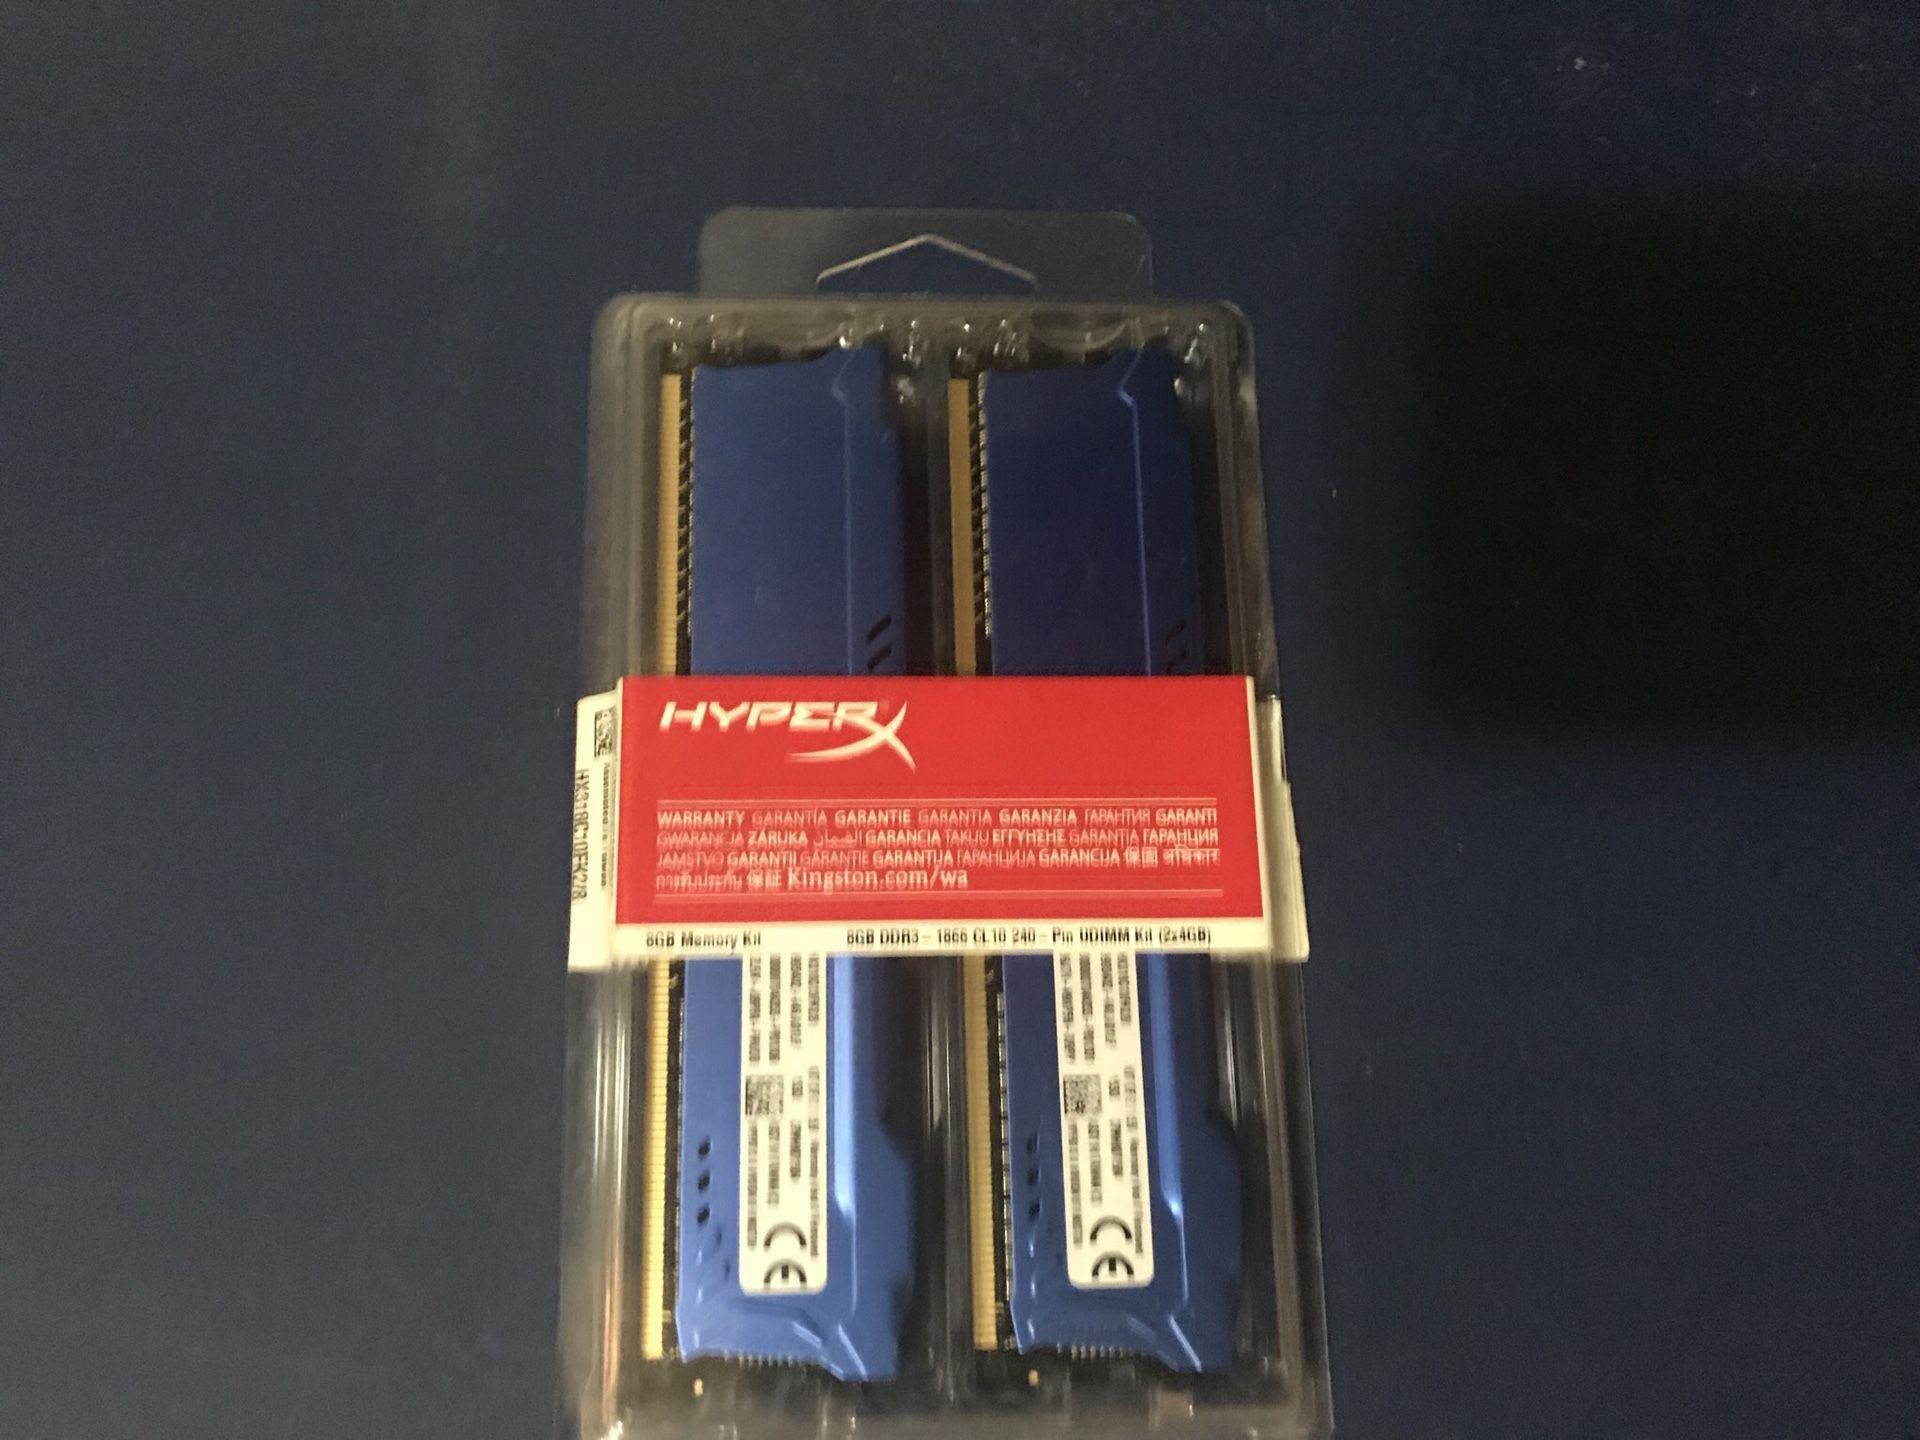 Kingston HyperX Fury 2x4 GB DDR3 1866Mhz PC memory